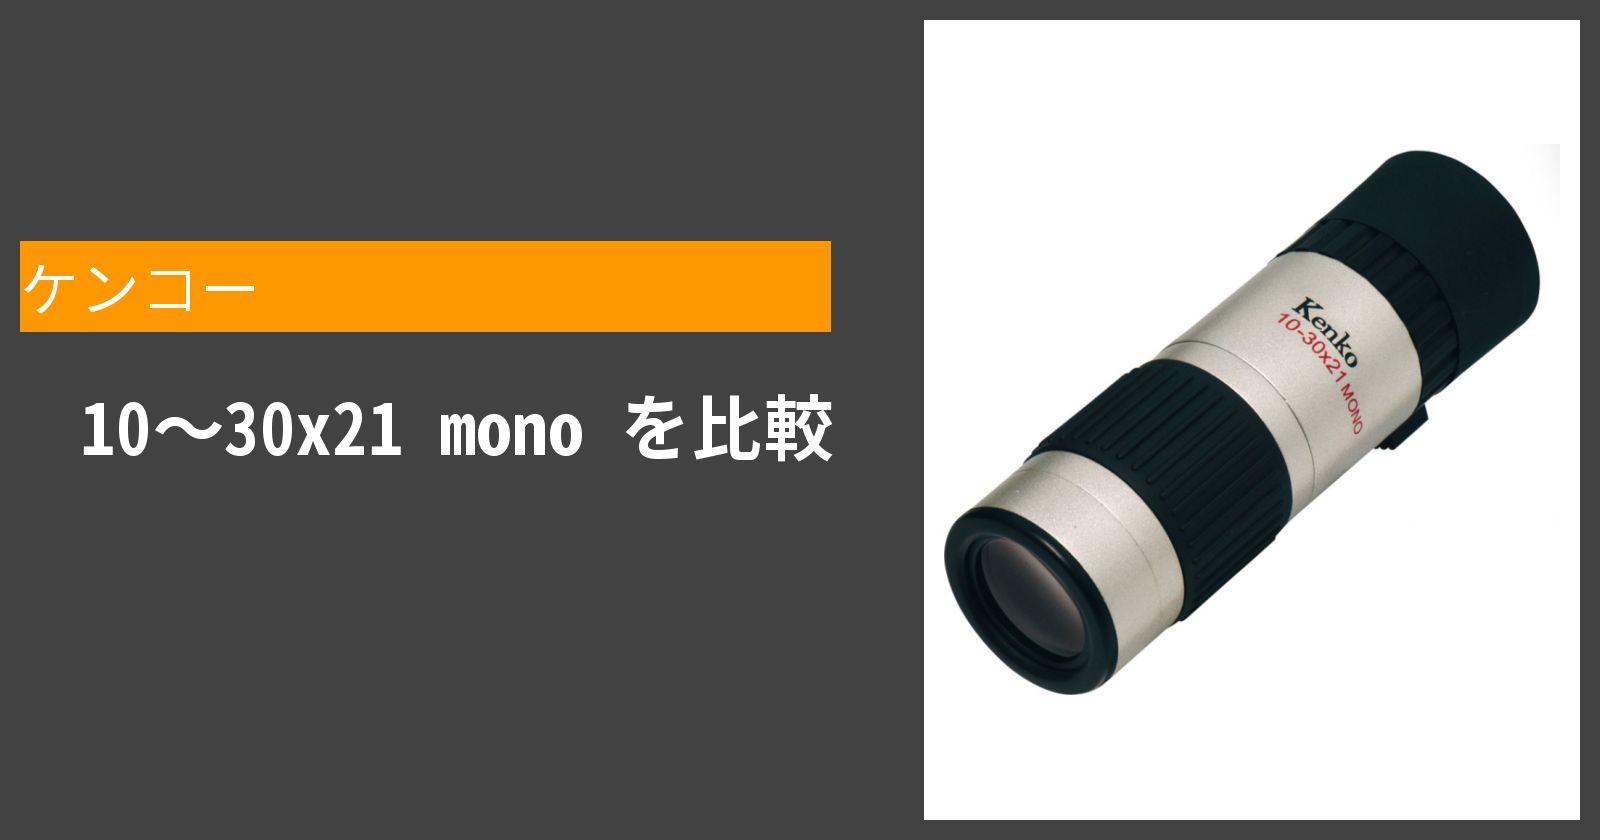 10〜30x21 monoを徹底評価